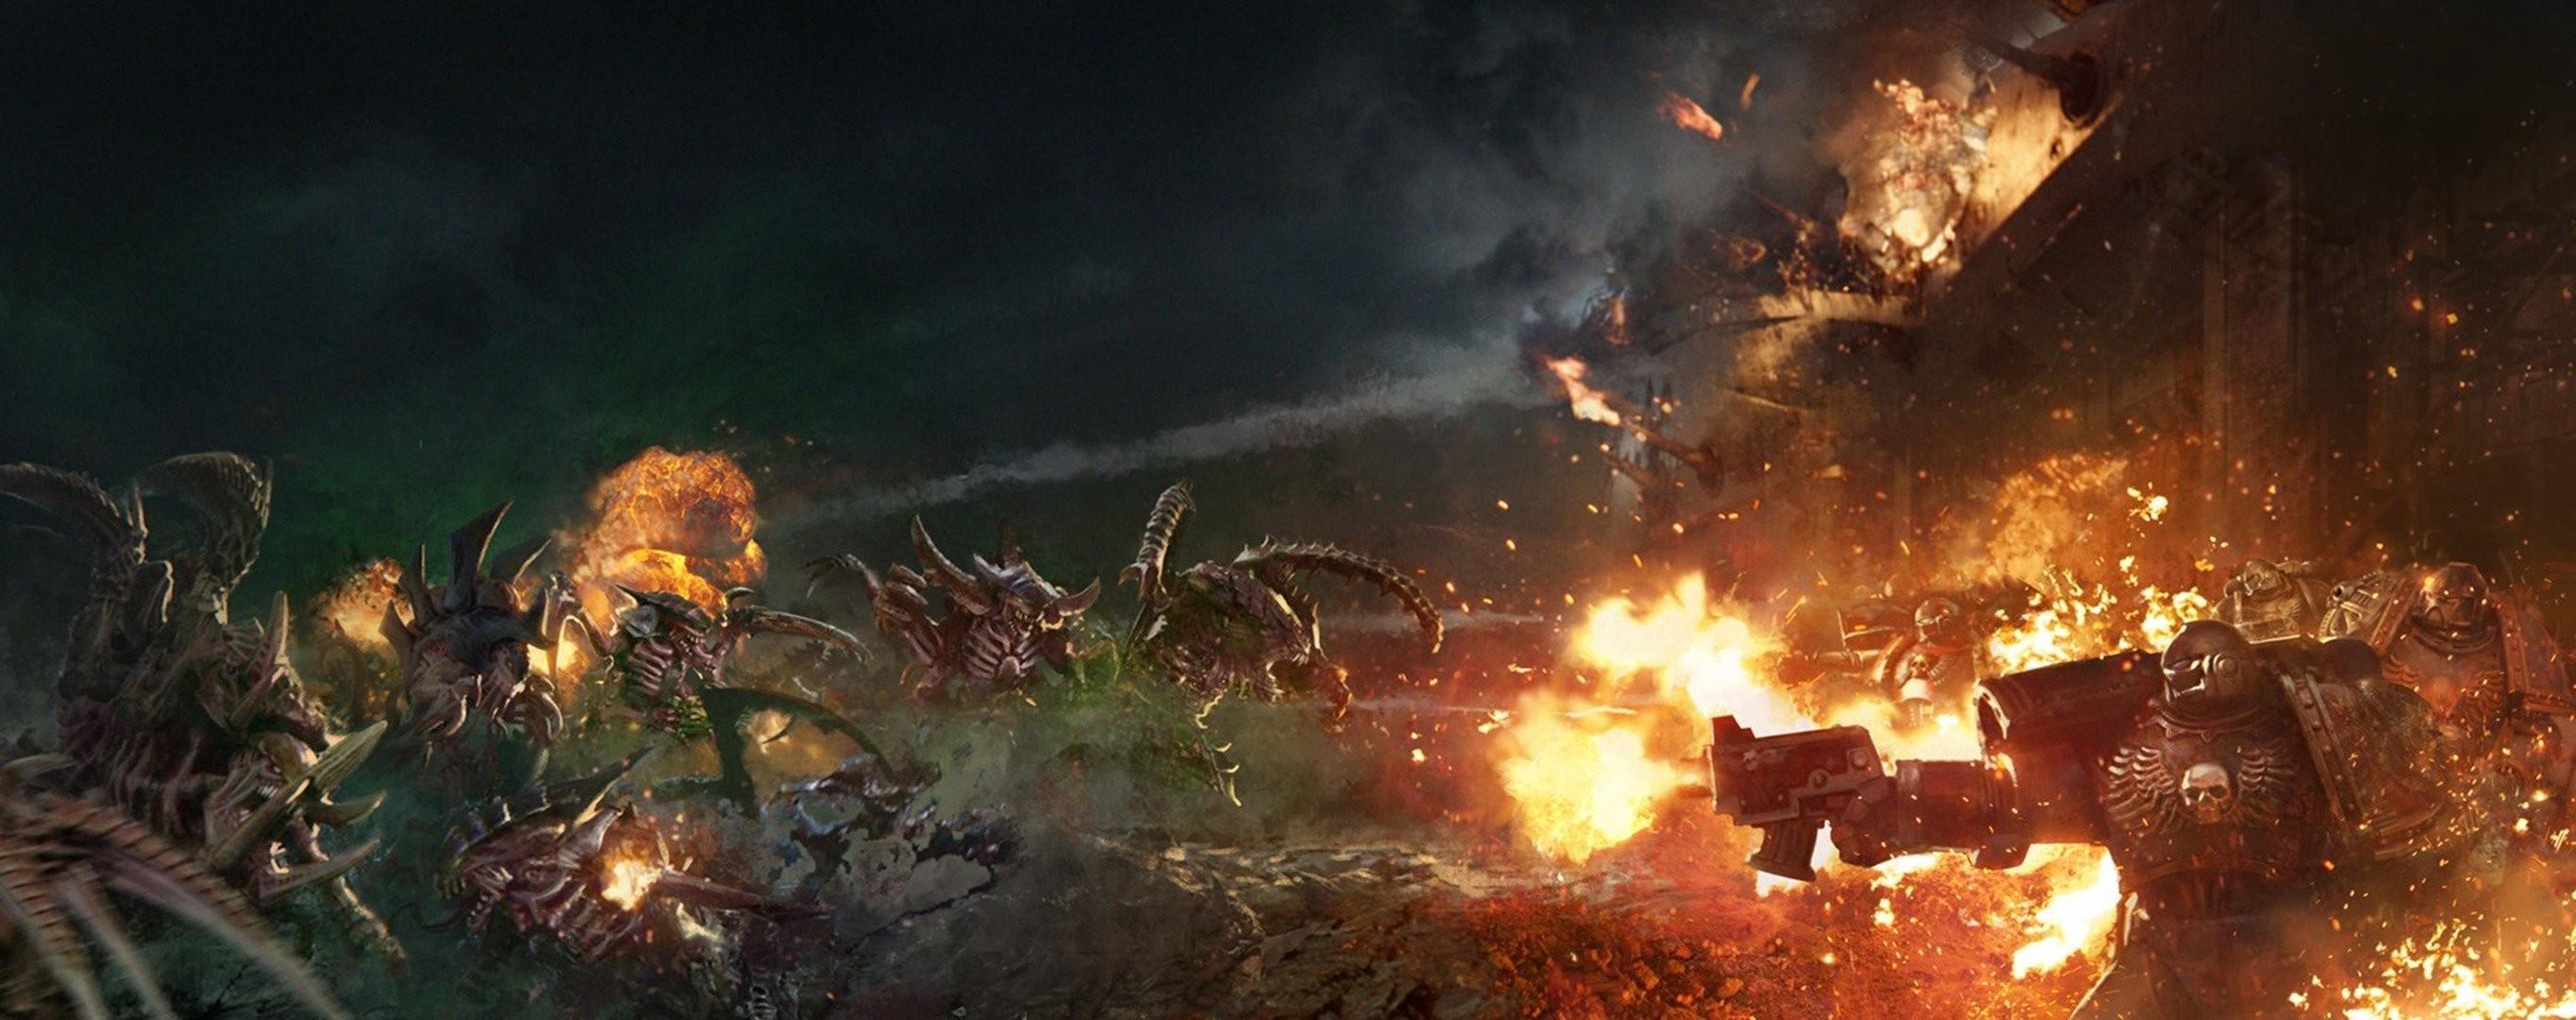 tyranids warhammer 40k warhammer 40.000 warhammer alien flesh tearers  shield of baal: exterminatus war